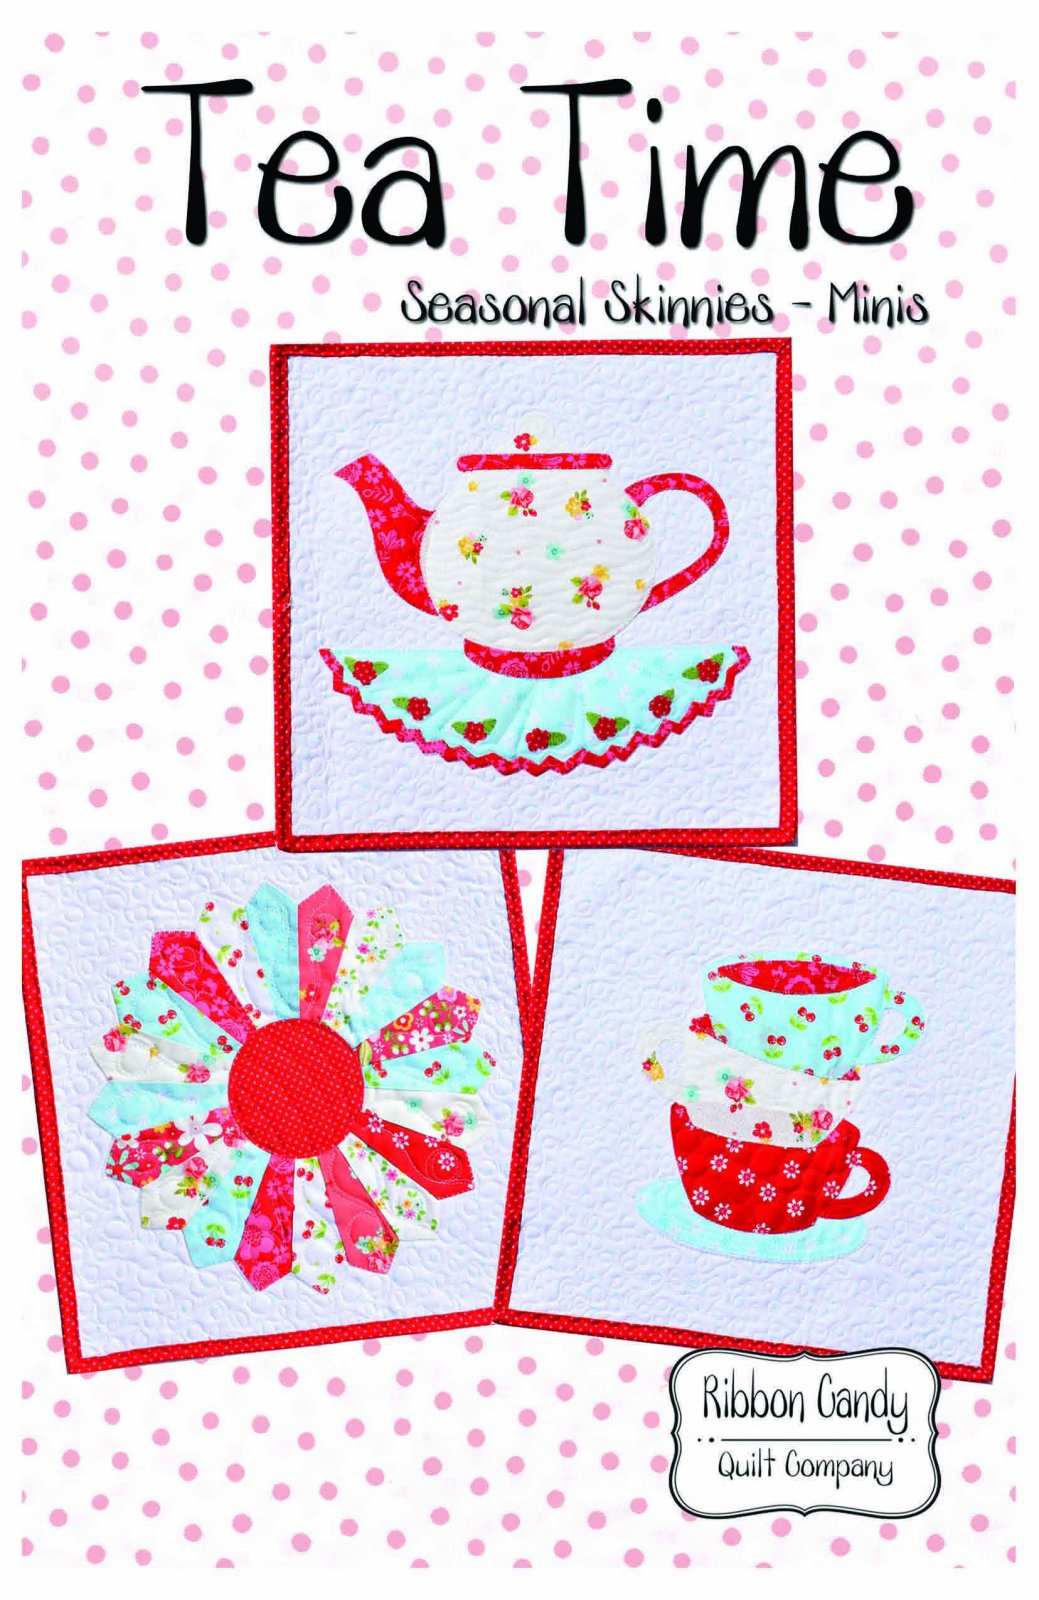 Tea Time - Skinnie Mini's